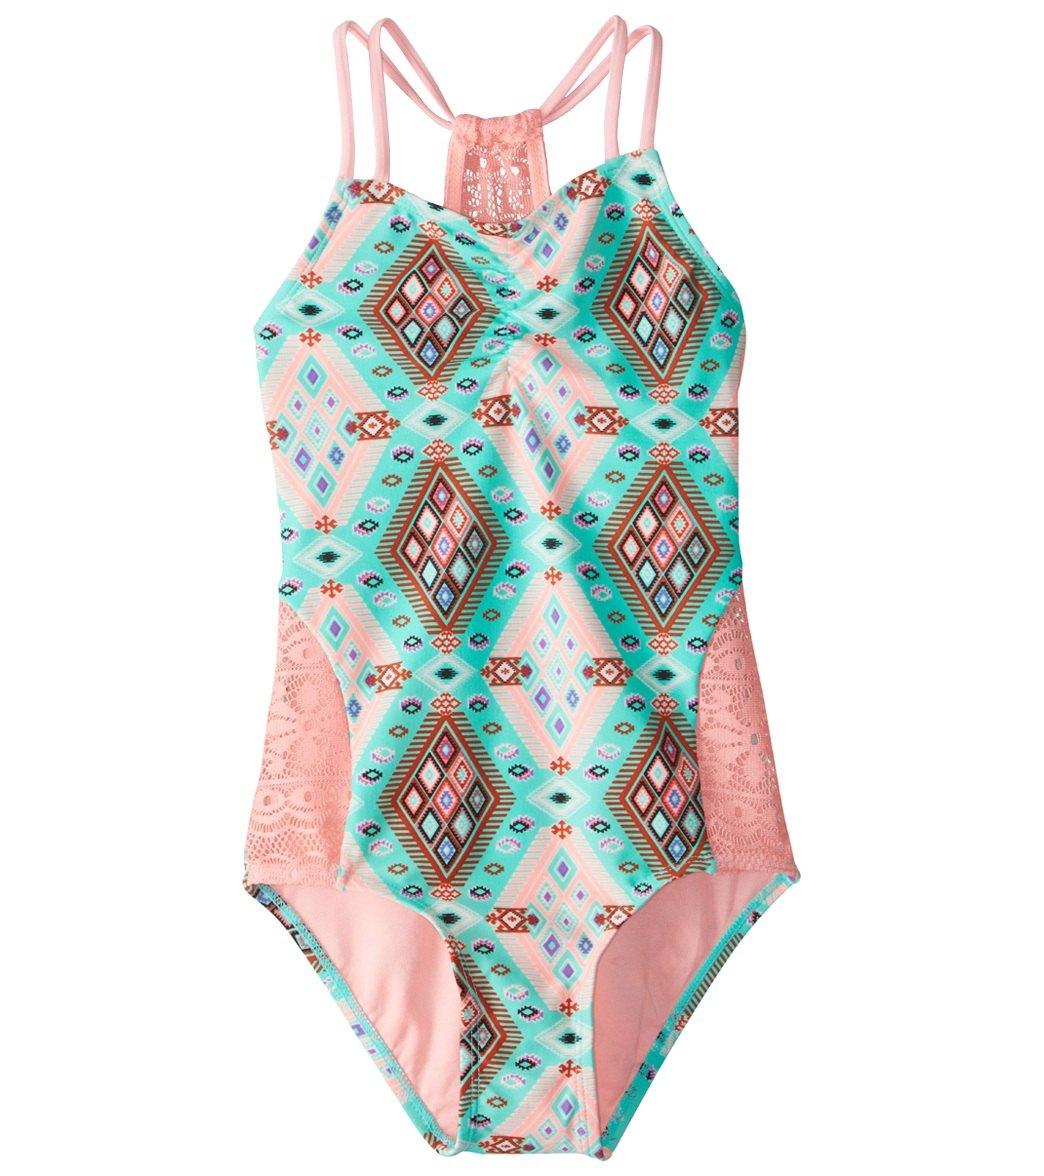 60135b6534 Gossip Girls' Aztec Harvest One Piece Swimsuit (7-16) at SwimOutlet ...